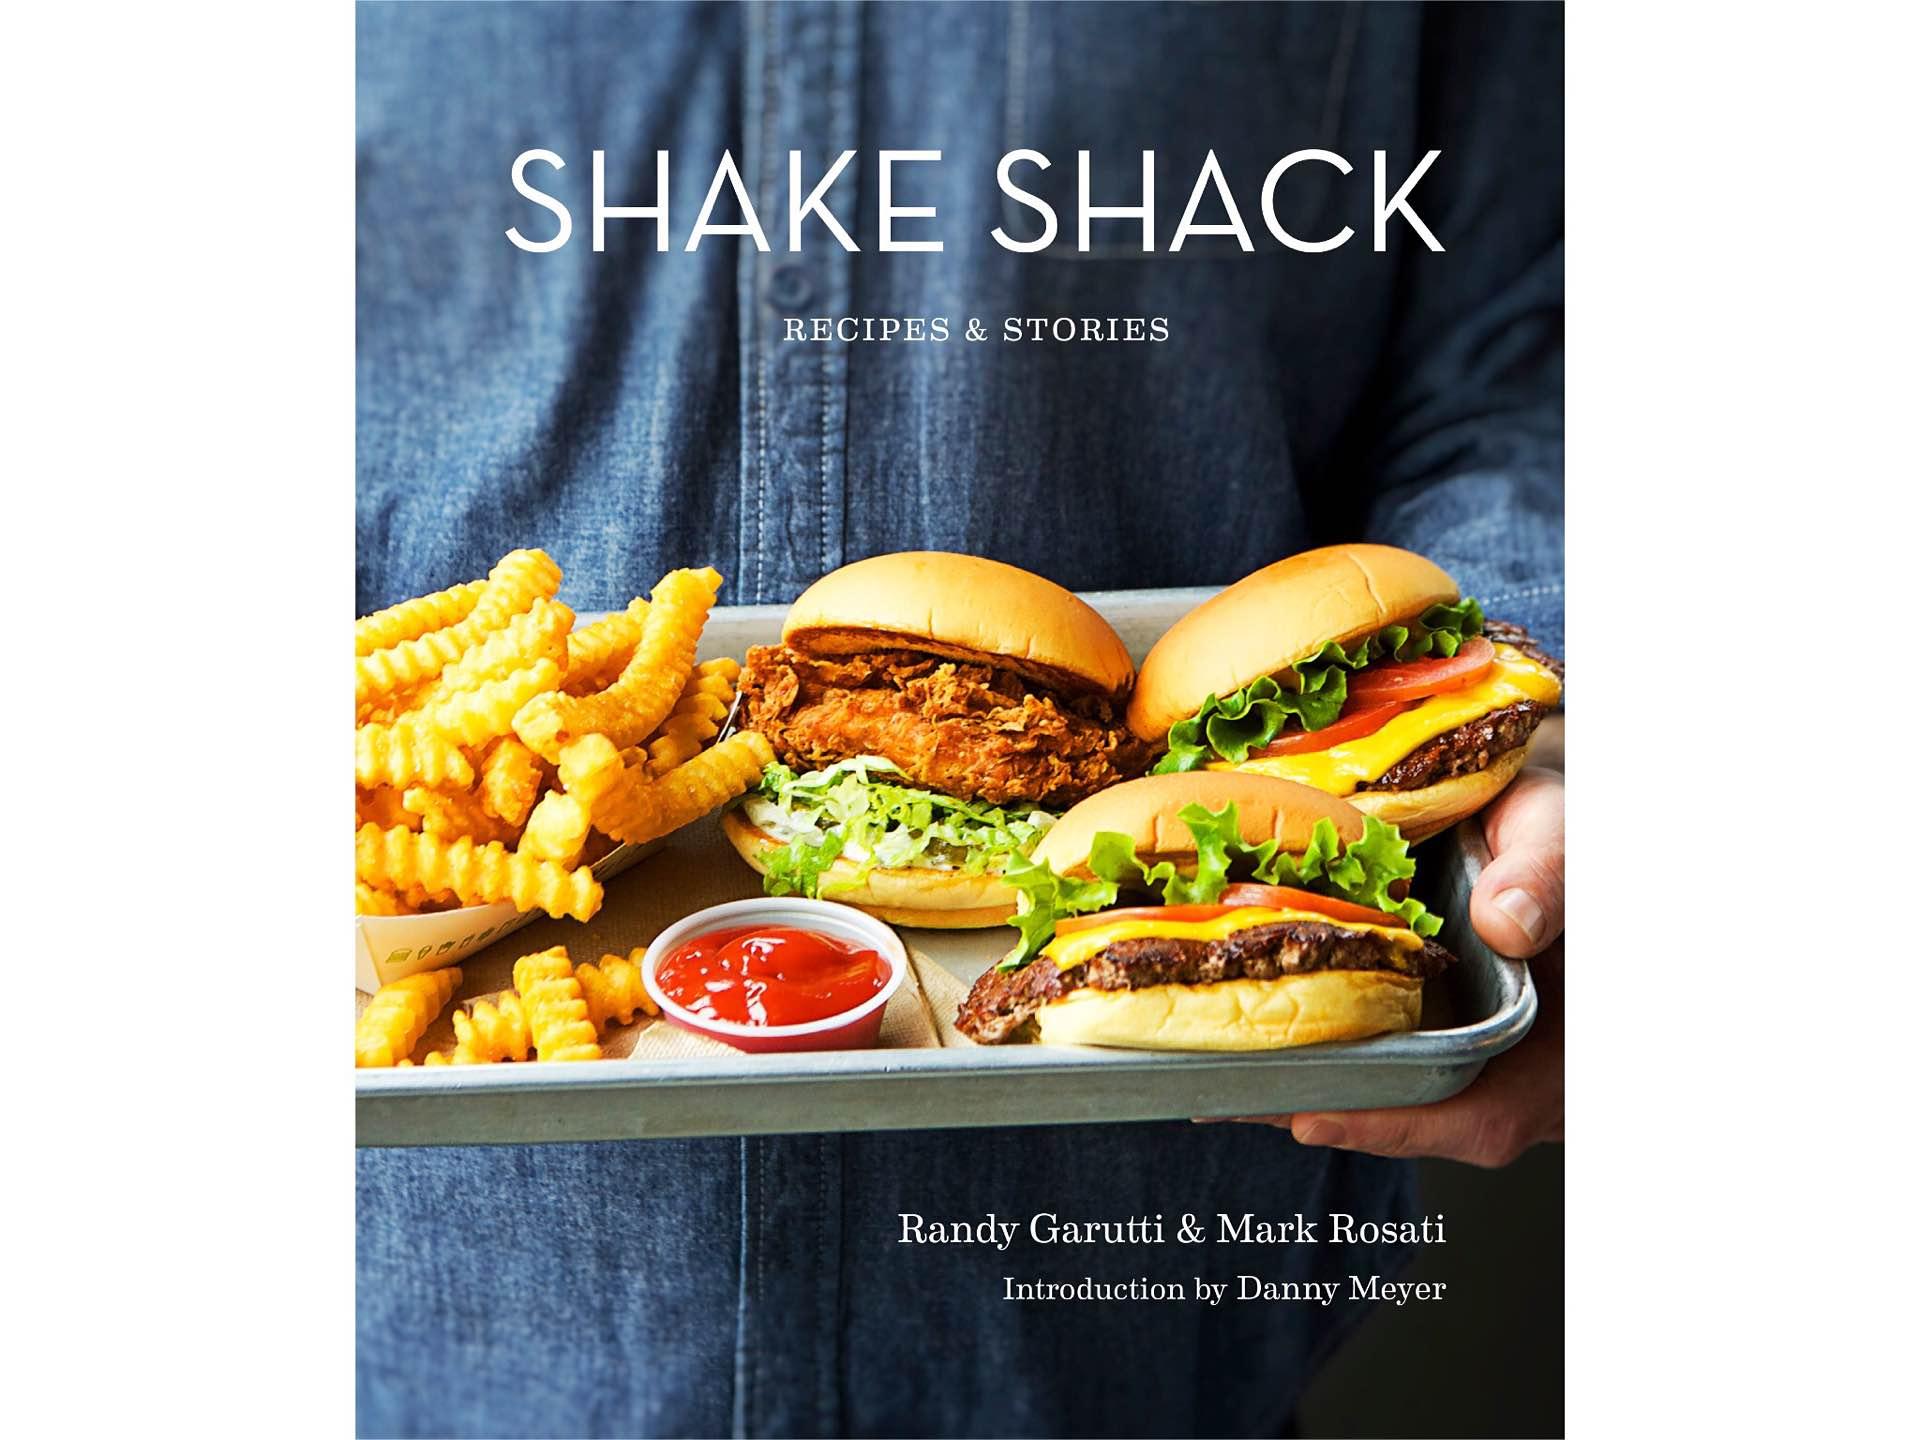 Shake Shack: Stories & Recipes by Randy Garutti, Mark Rosati, and Dorothy Kalins.